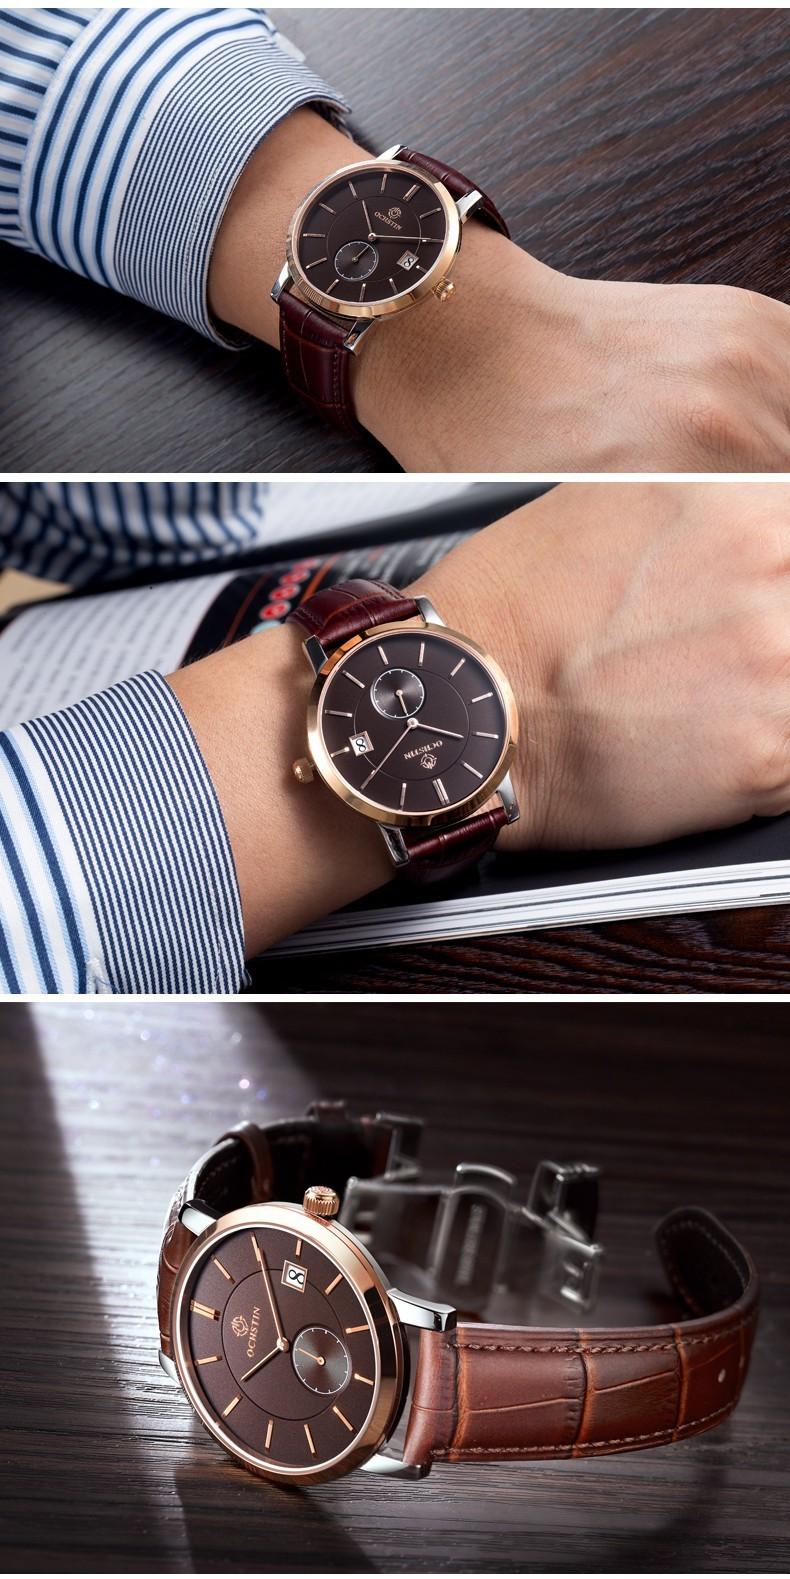 Мода OCHSTIN Марка Мужчины Кварцевые Часы Мужчин Мужской Платье Часы Военные Часы Мужчины Relogio Masculino Montre Homme Reloj